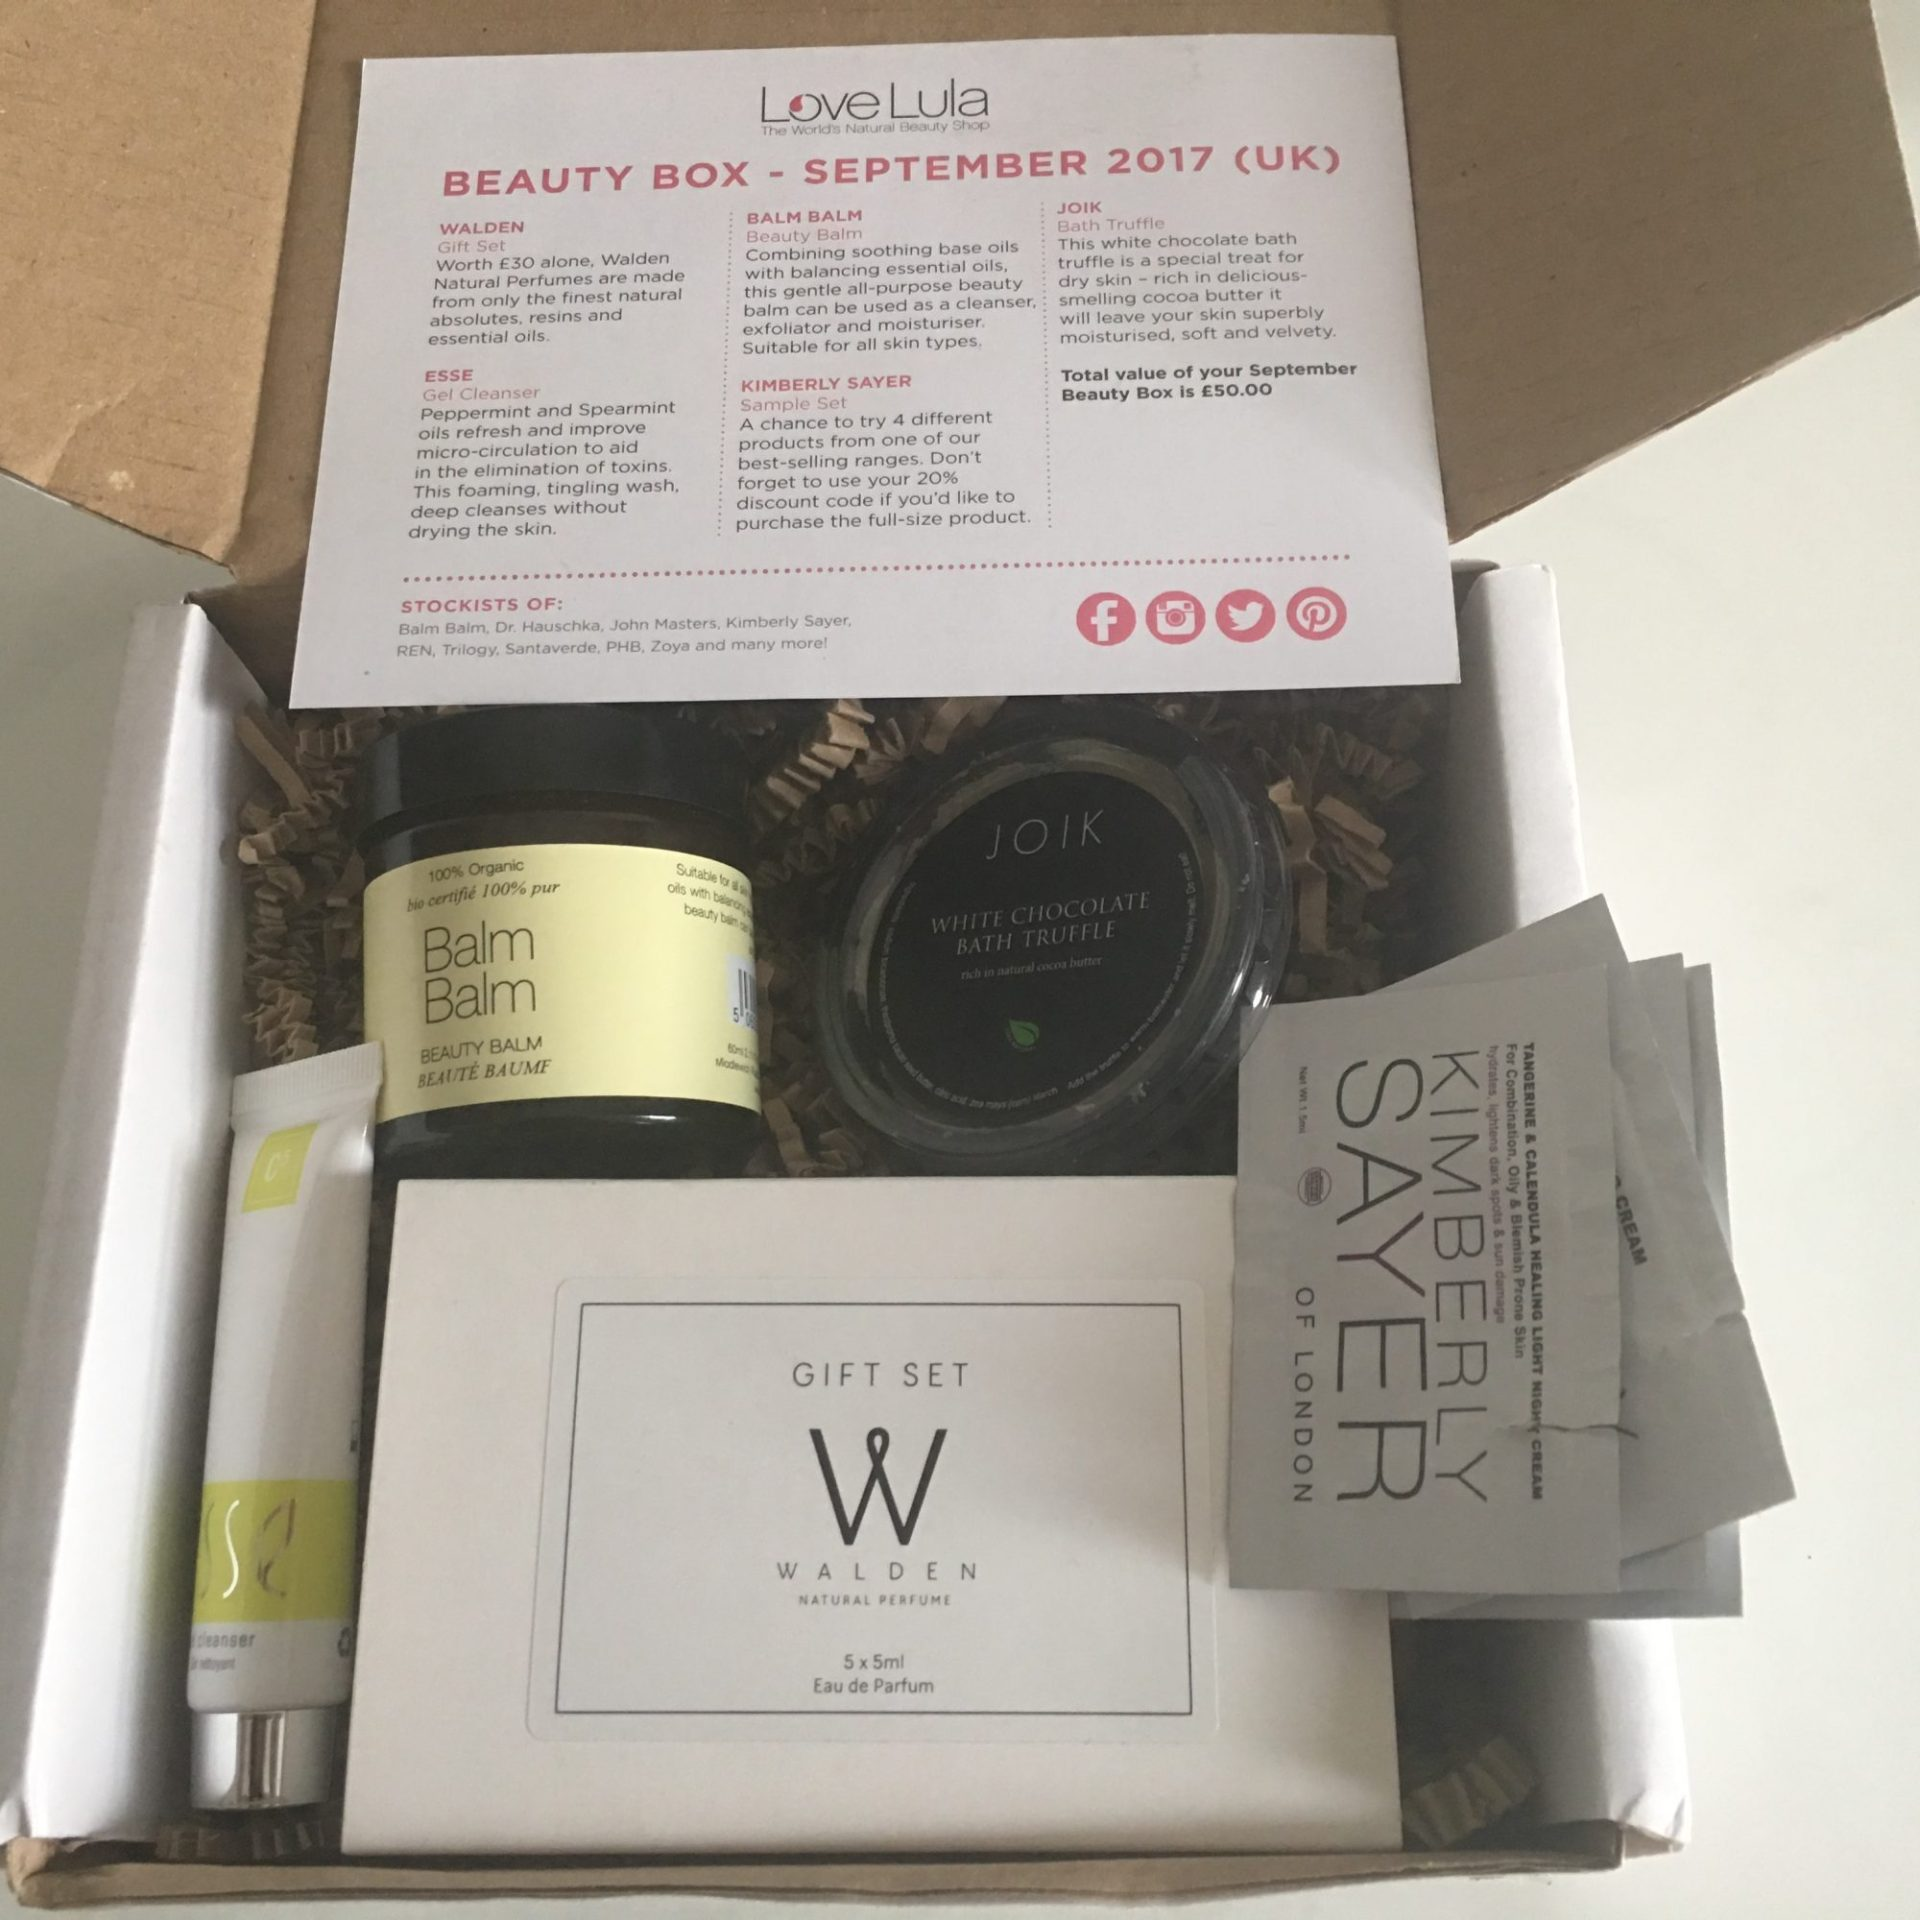 LoveLula Beauty Box - September 2017